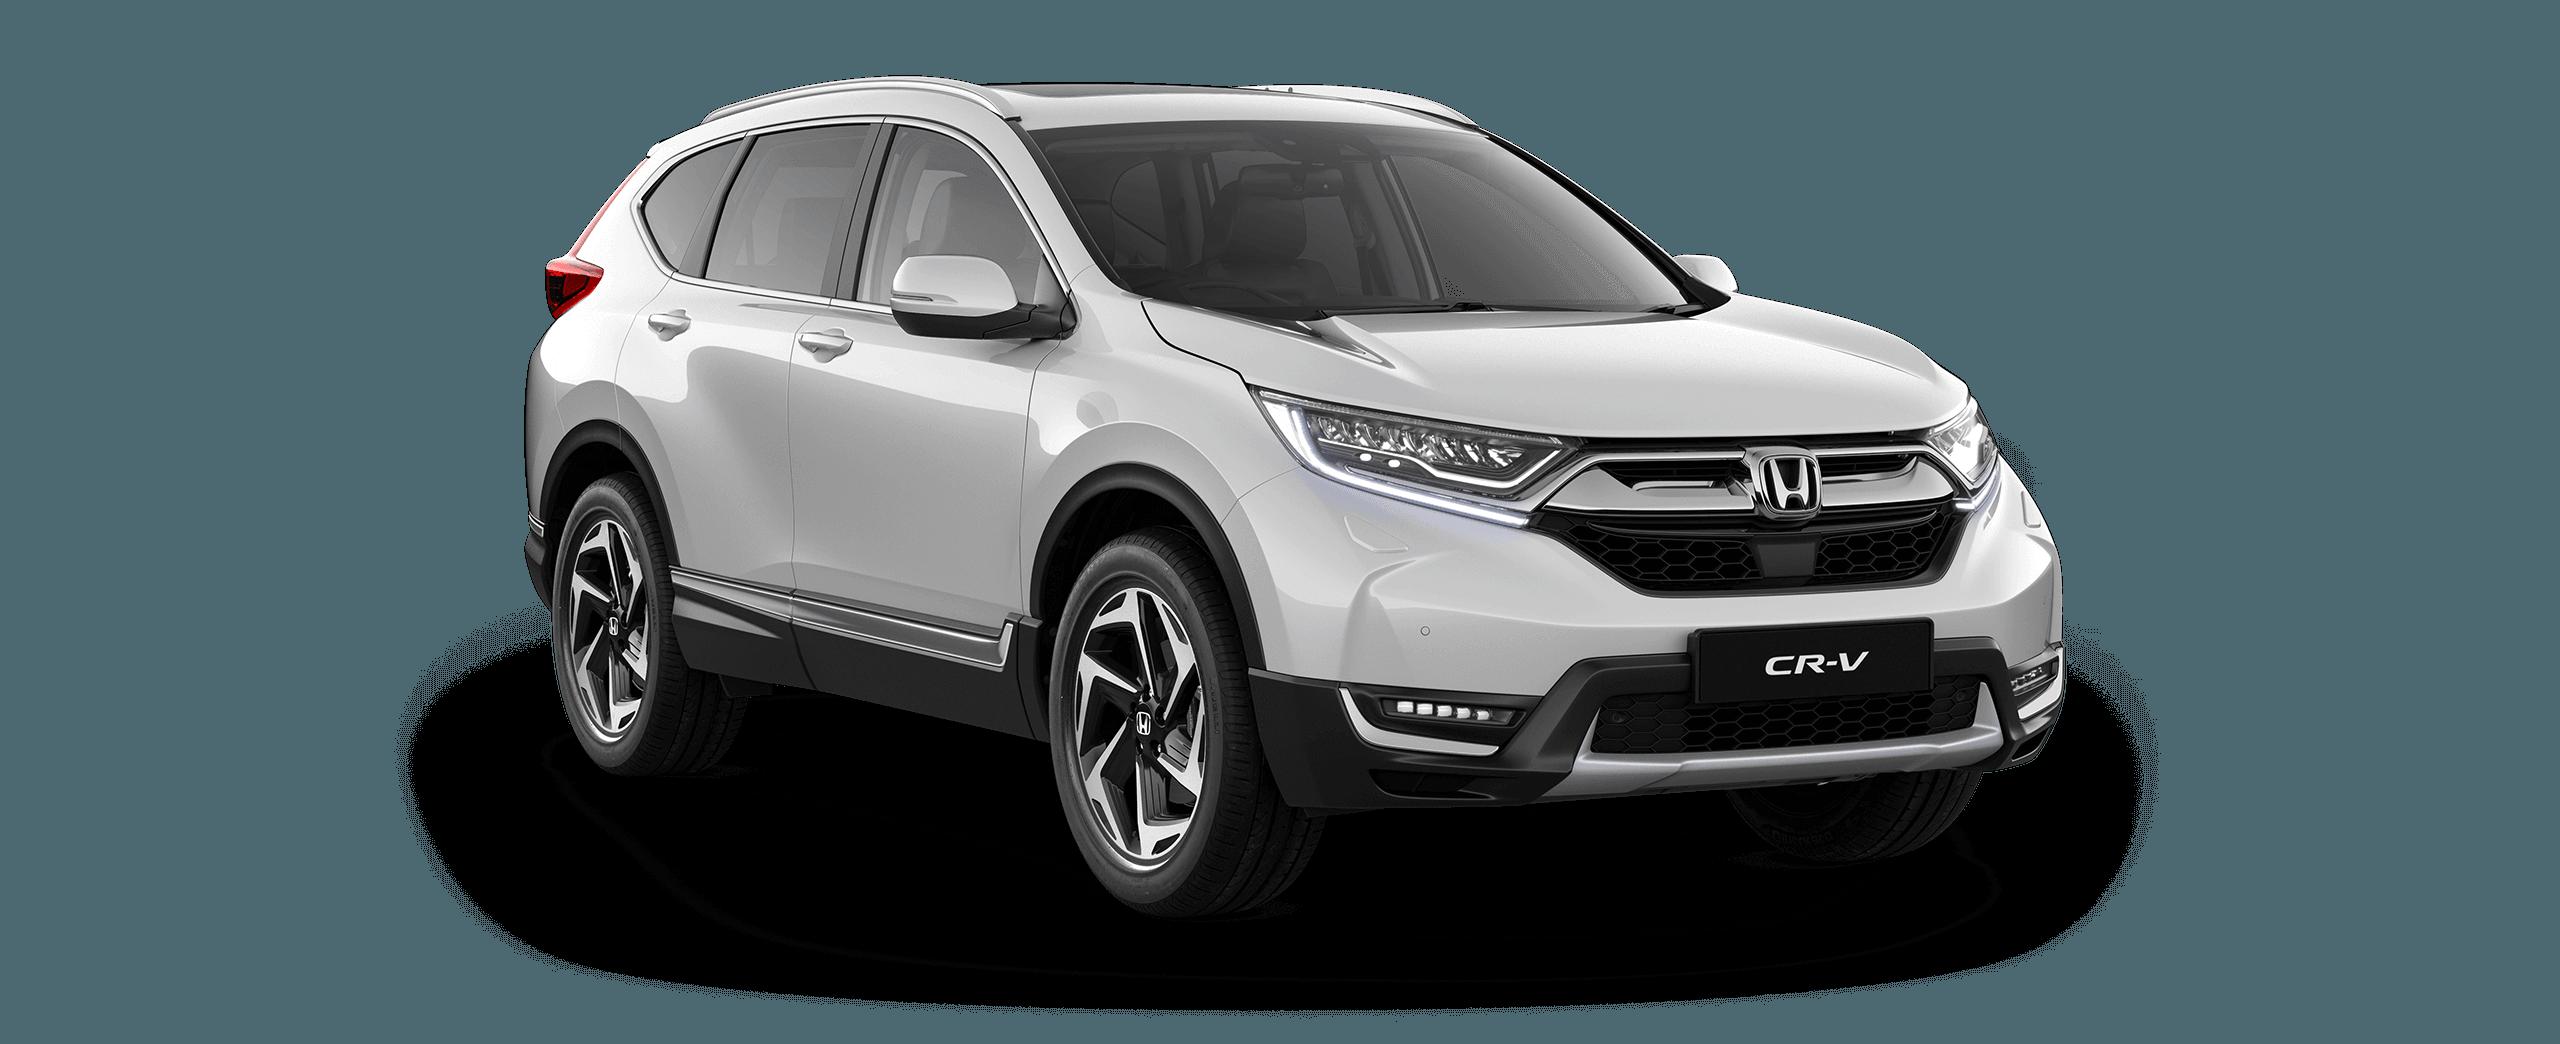 Used Honda Hrv >> CR-V Hybrid - Crown Garage Honda